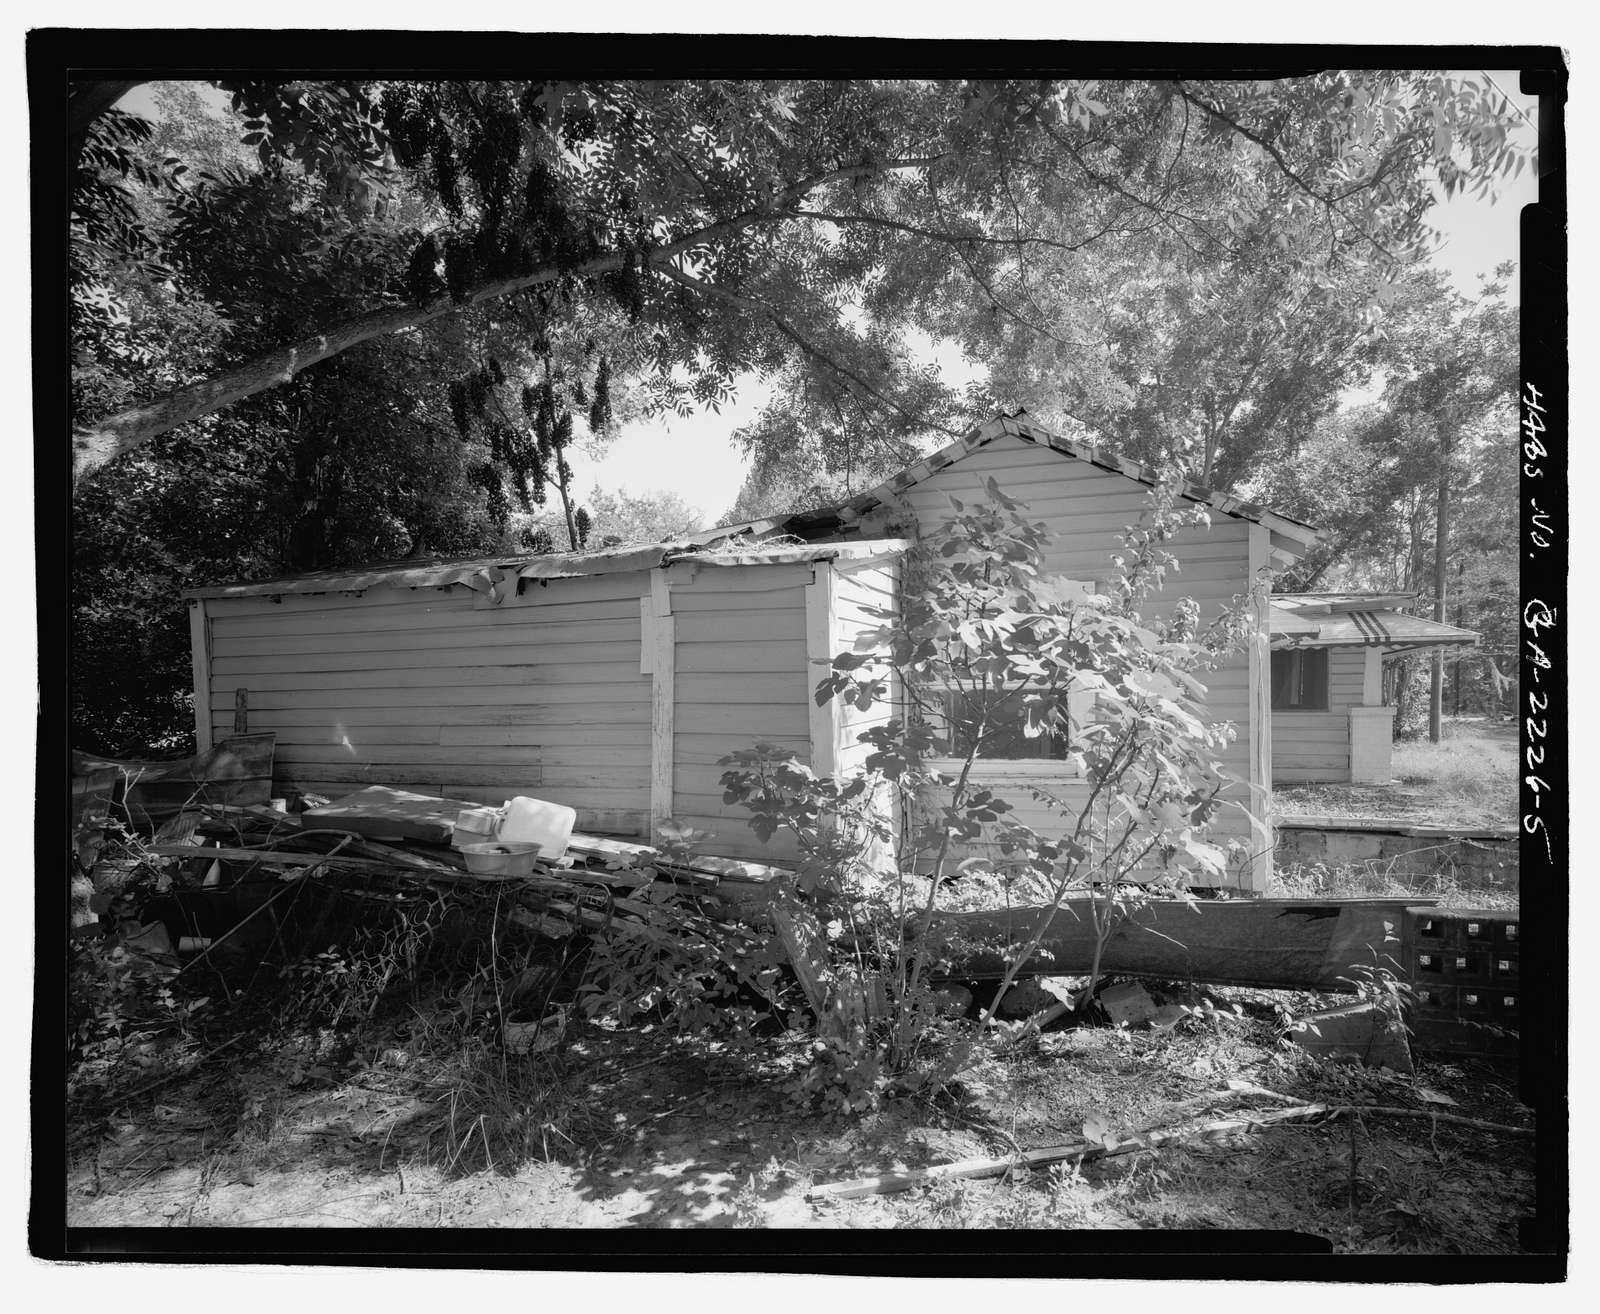 808 Short Bewick Street (House), Waycross, Ware County, GA